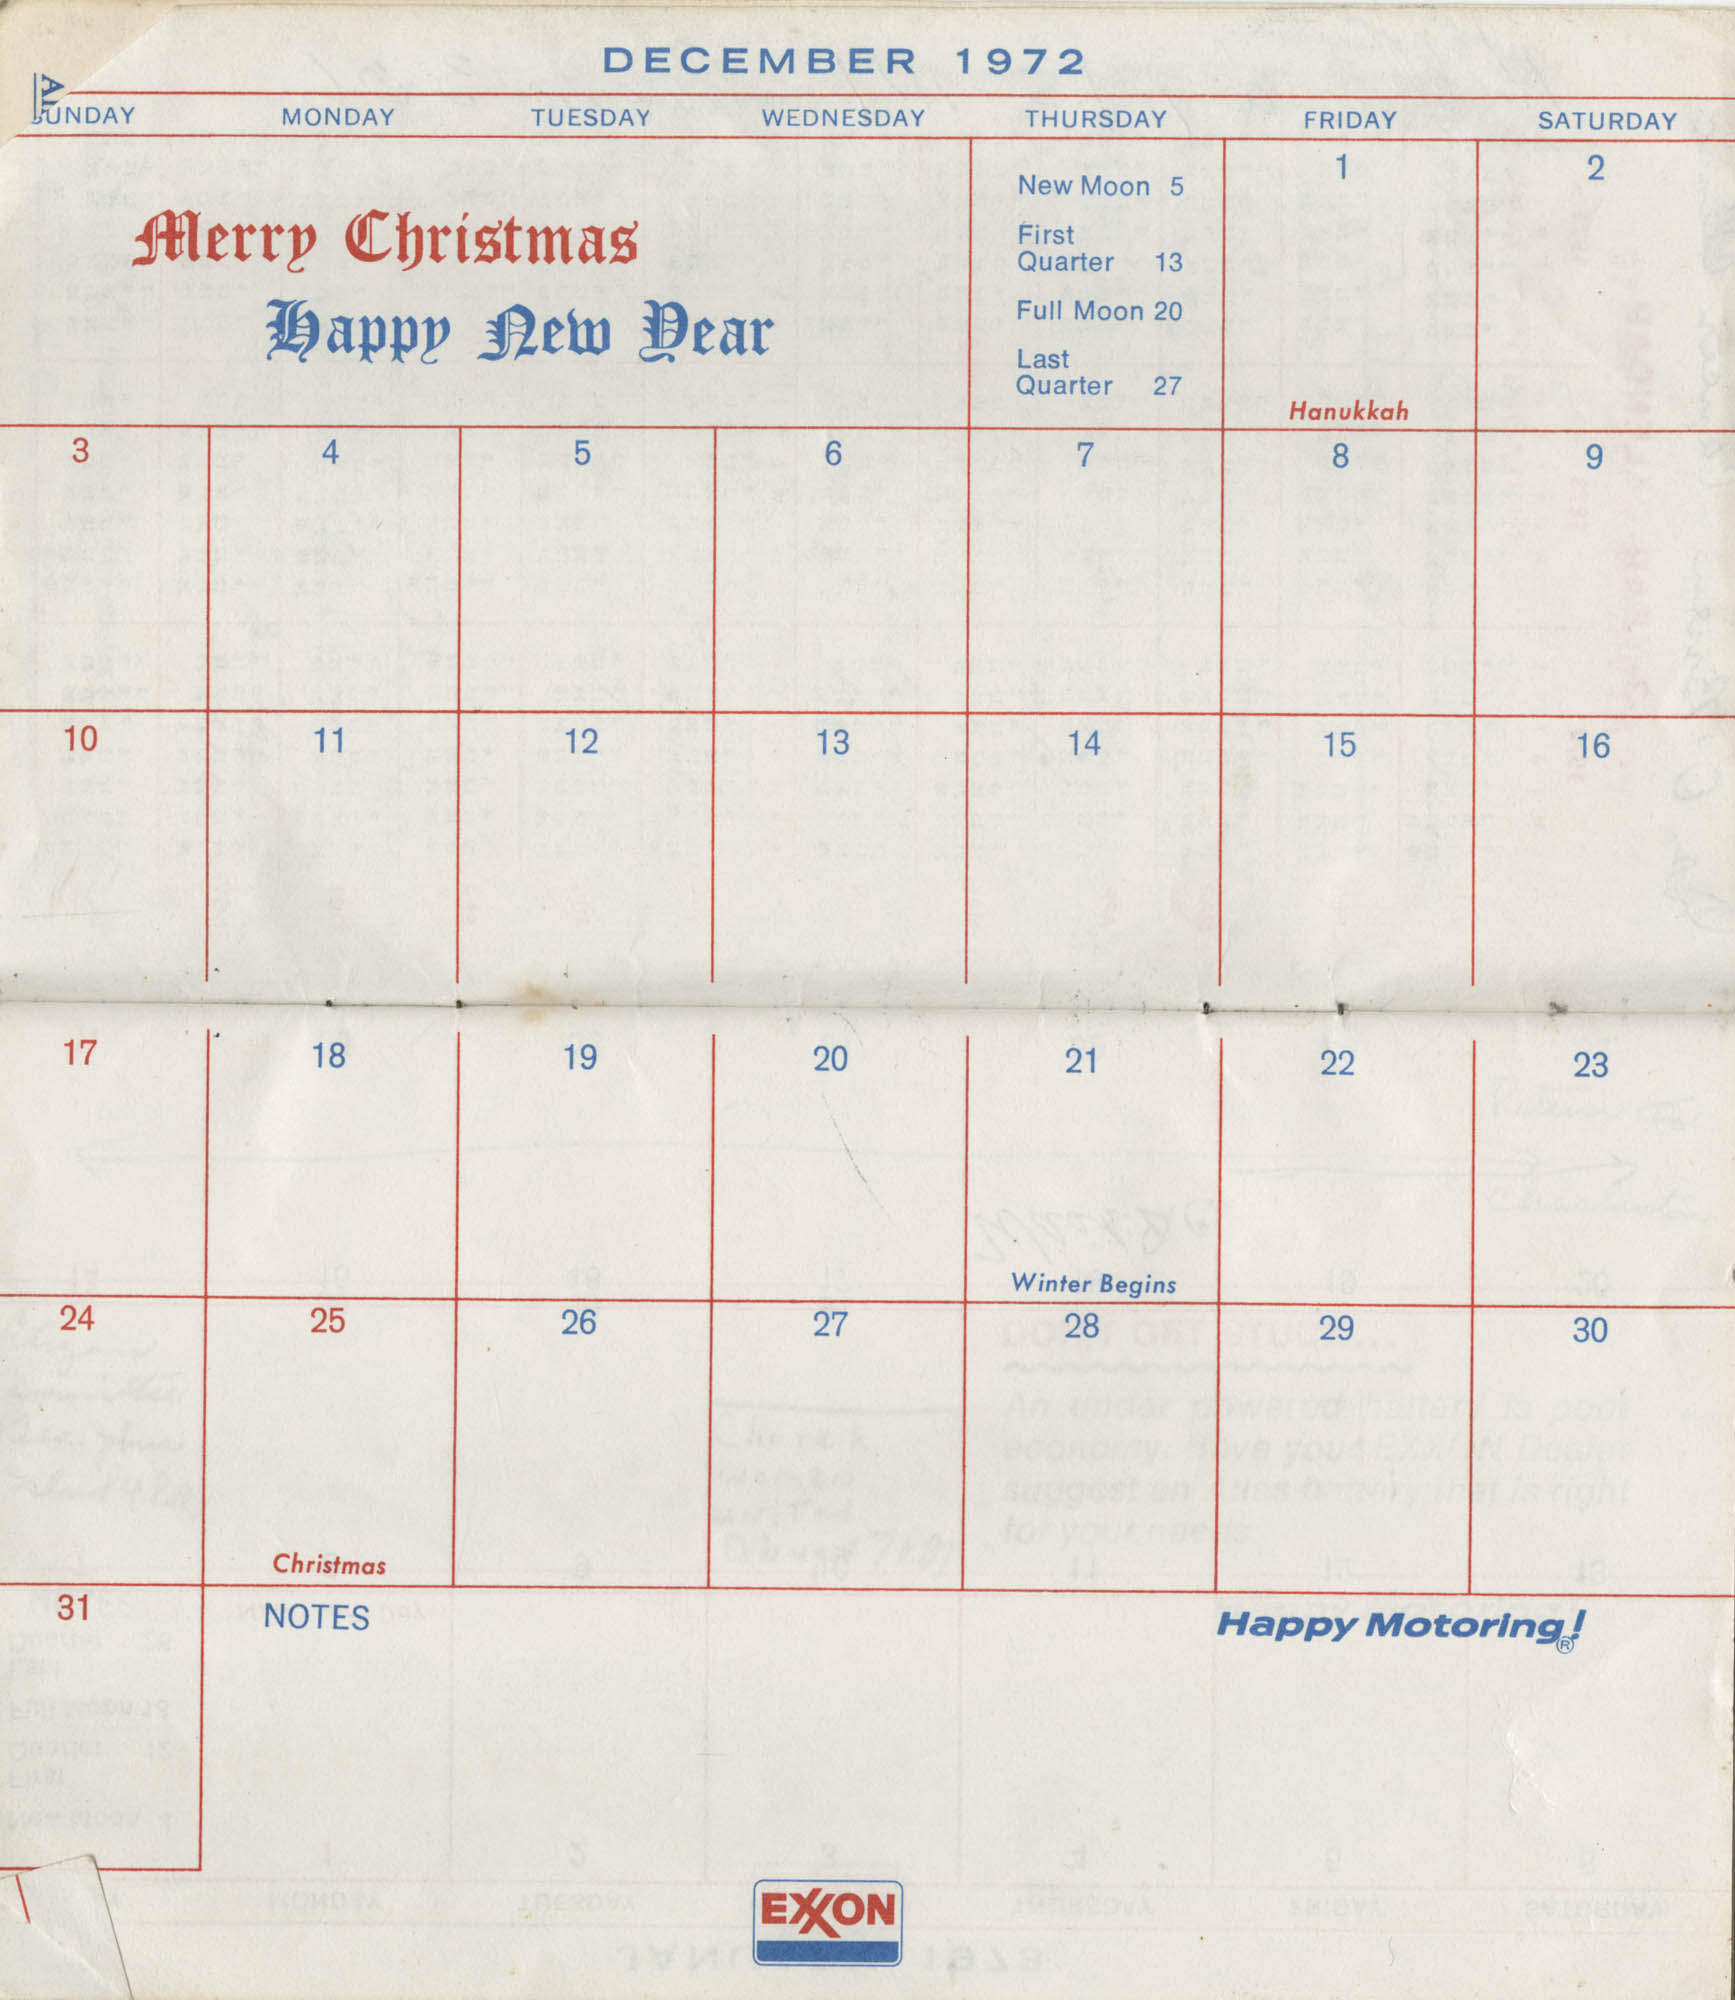 Bernice Robinson's 1973 Pocket Secretary, December 1972